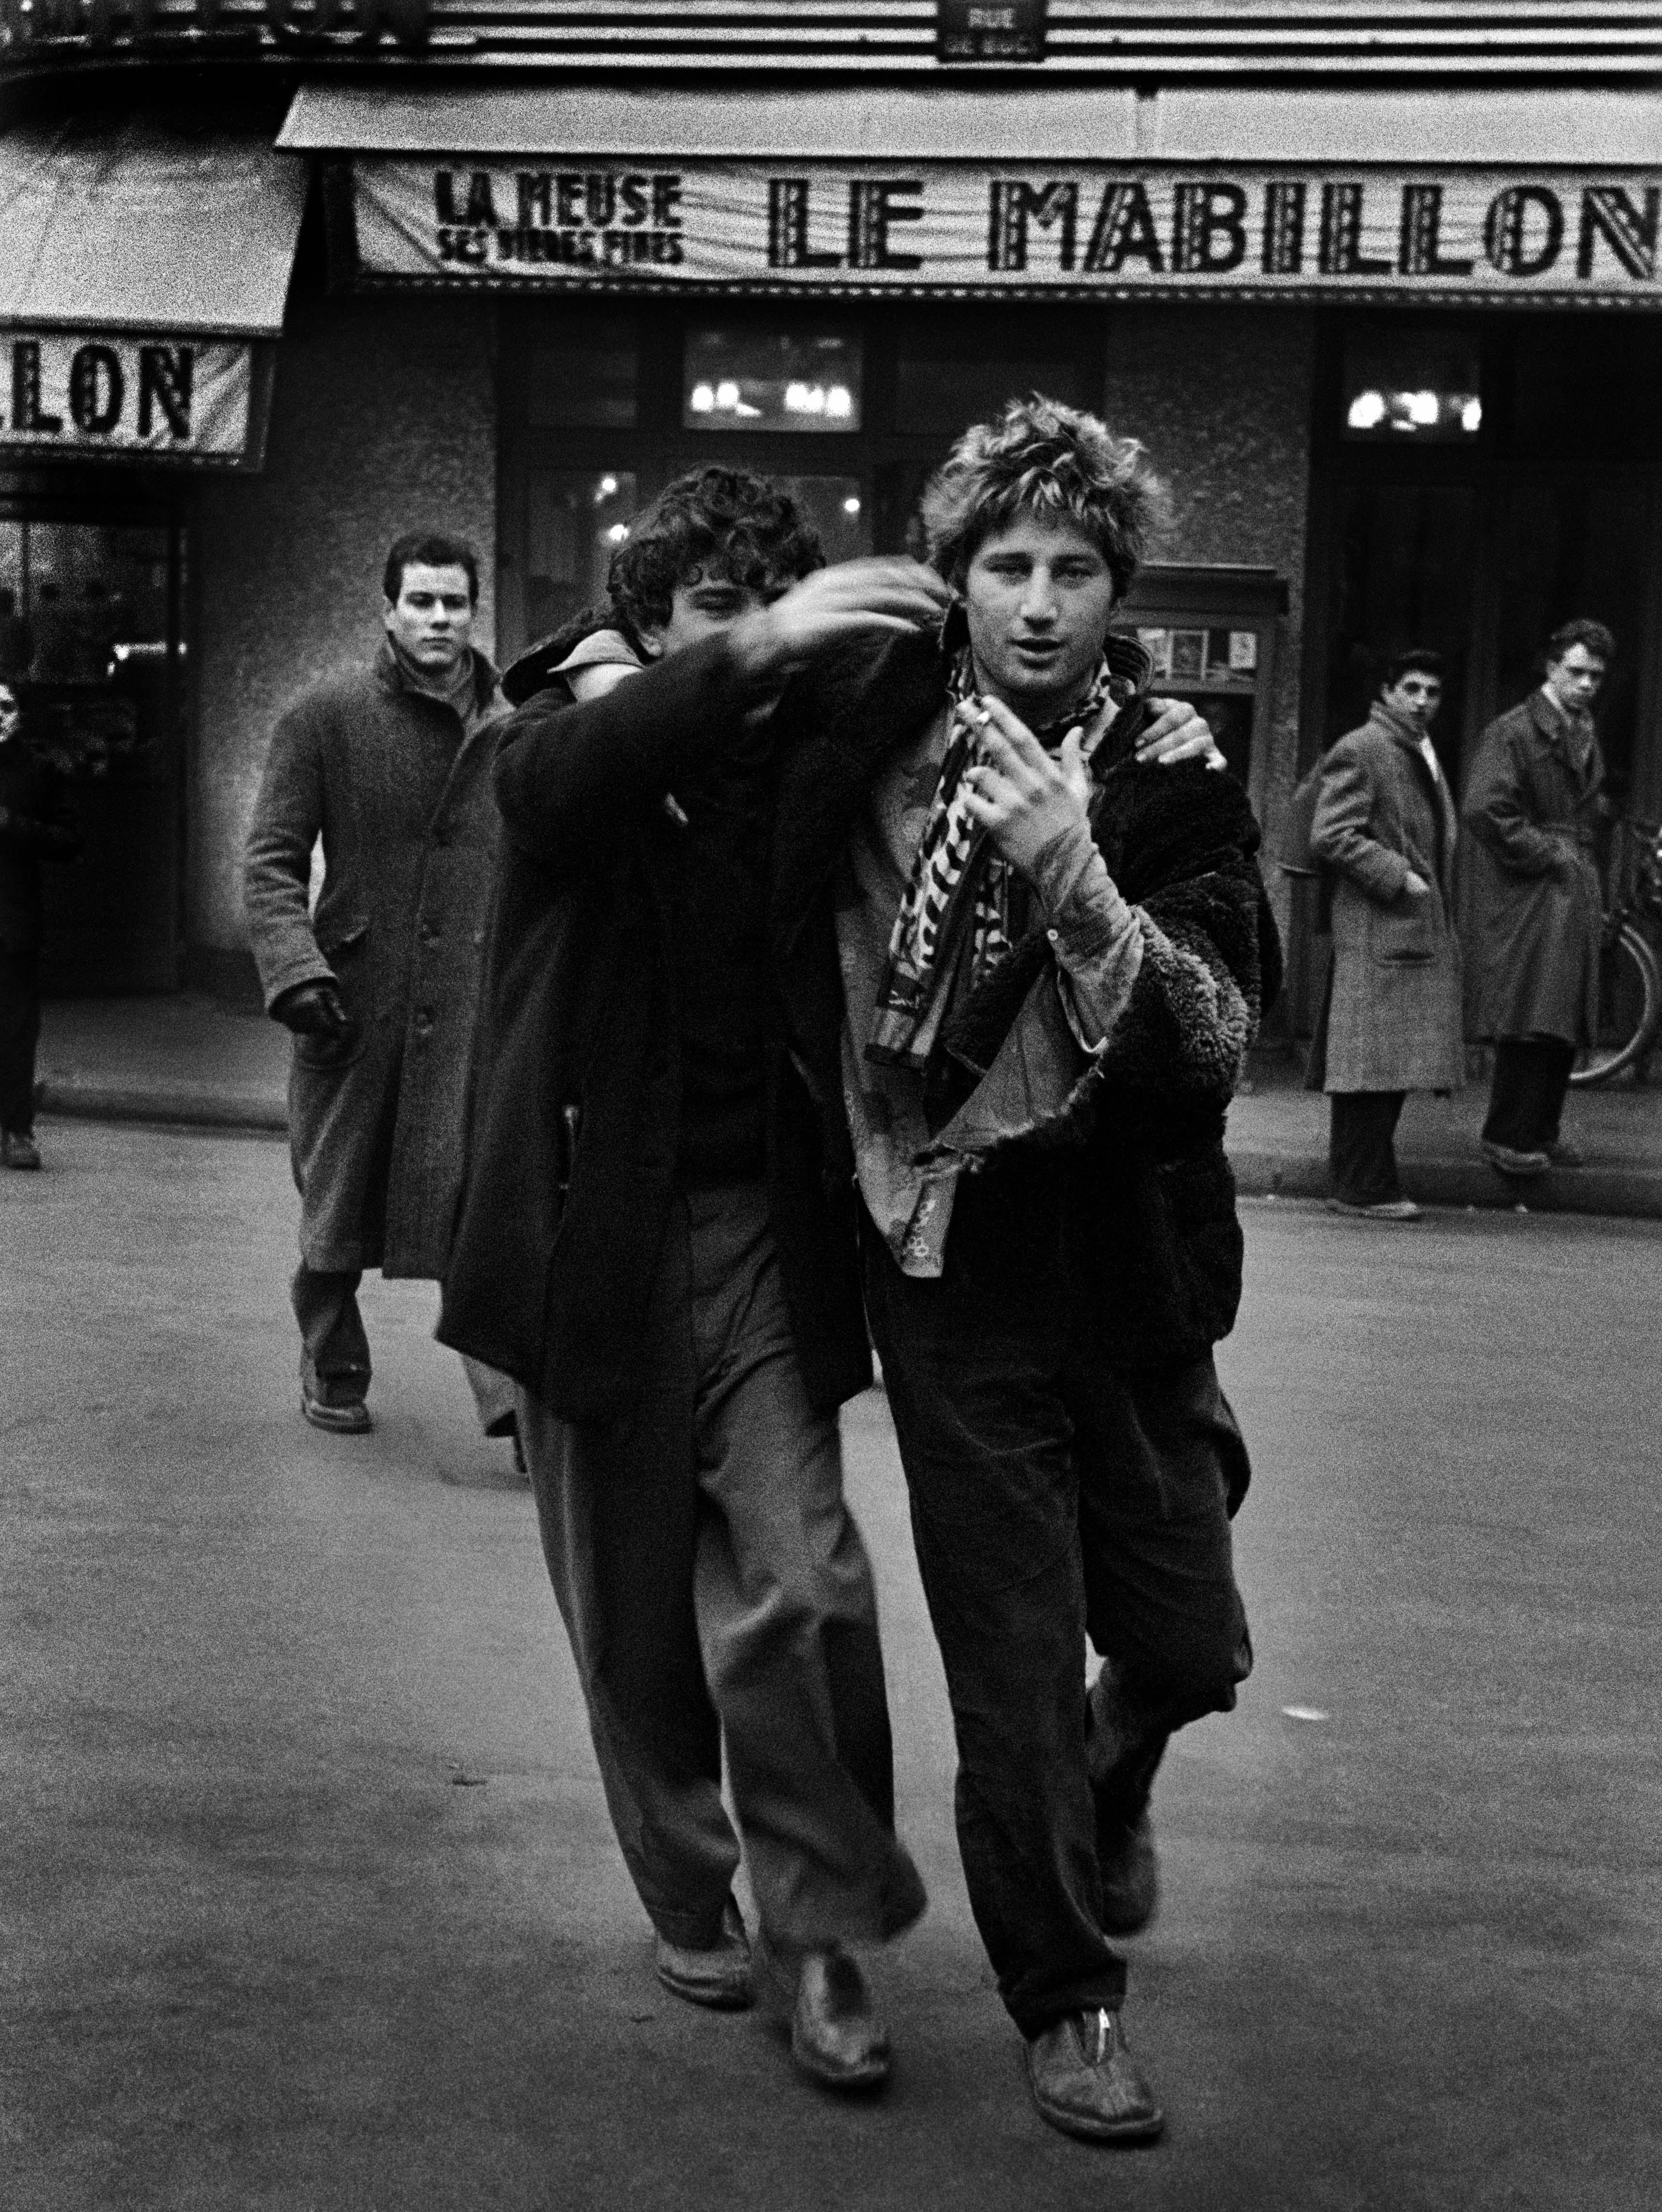 Ed van der Elsken, Jean-Michel Mension (Pierre ) and Auguste Hommel (Benny) devant le Mabillon, Paris , 1953 Nederlands Fotomuseum Rotterdam © Ed van der Elsken / Ed van der Elsken Estate